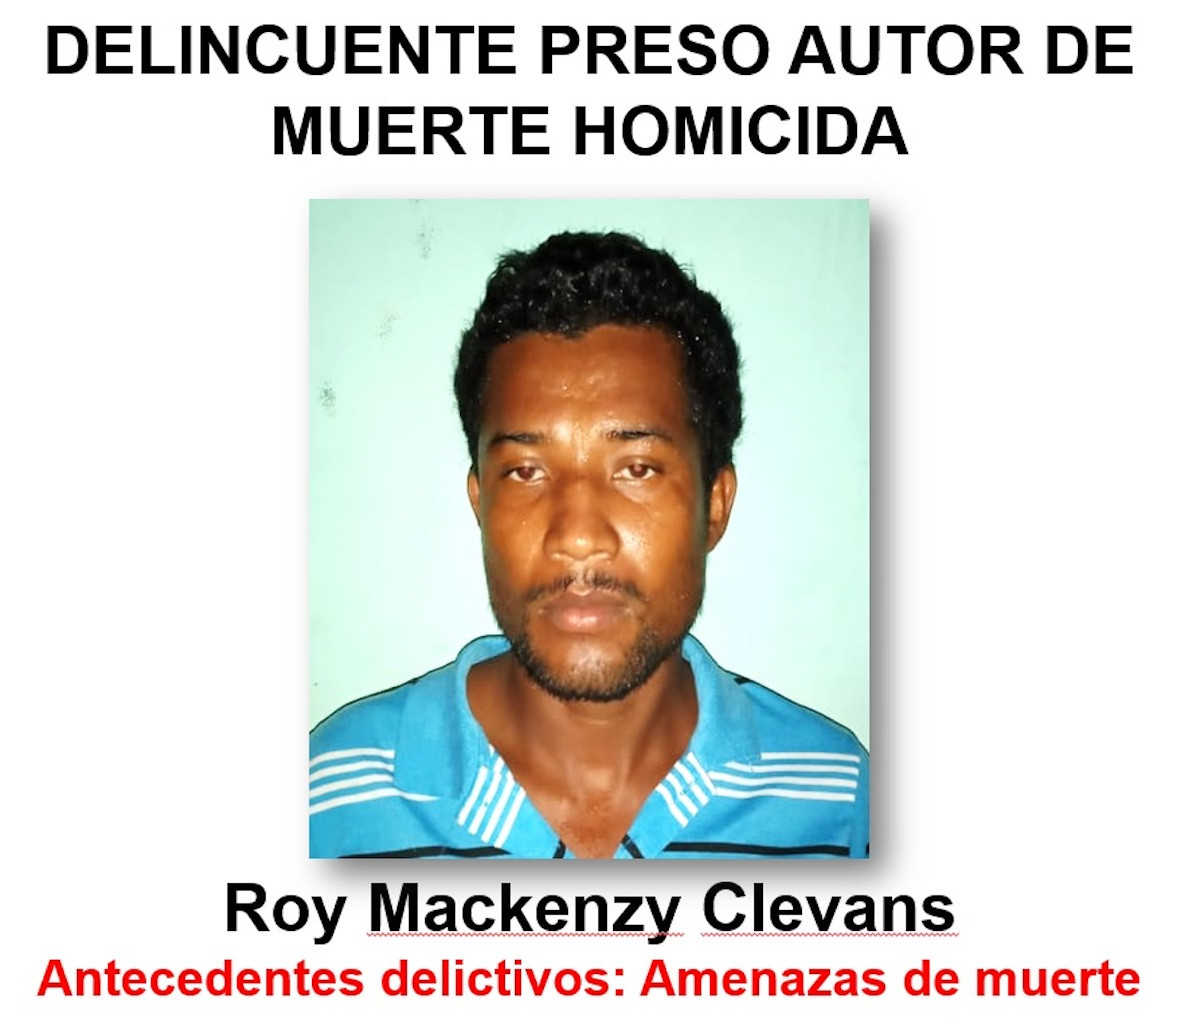 Roy Mackenzy Clevans